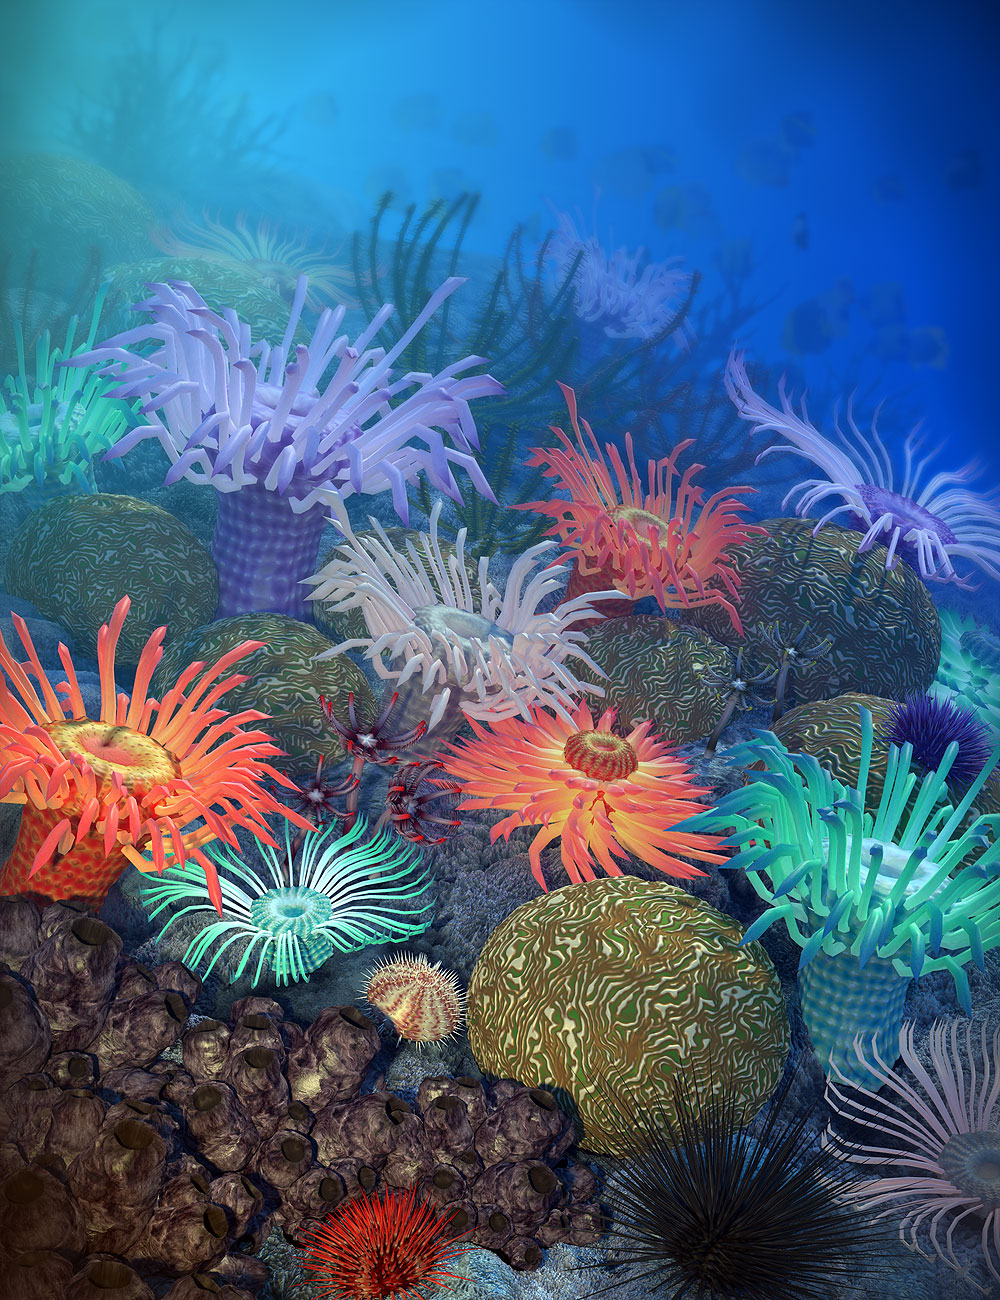 Gardens of Poseidon - Invertebrates by: Orestes Graphics, 3D Models by Daz 3D